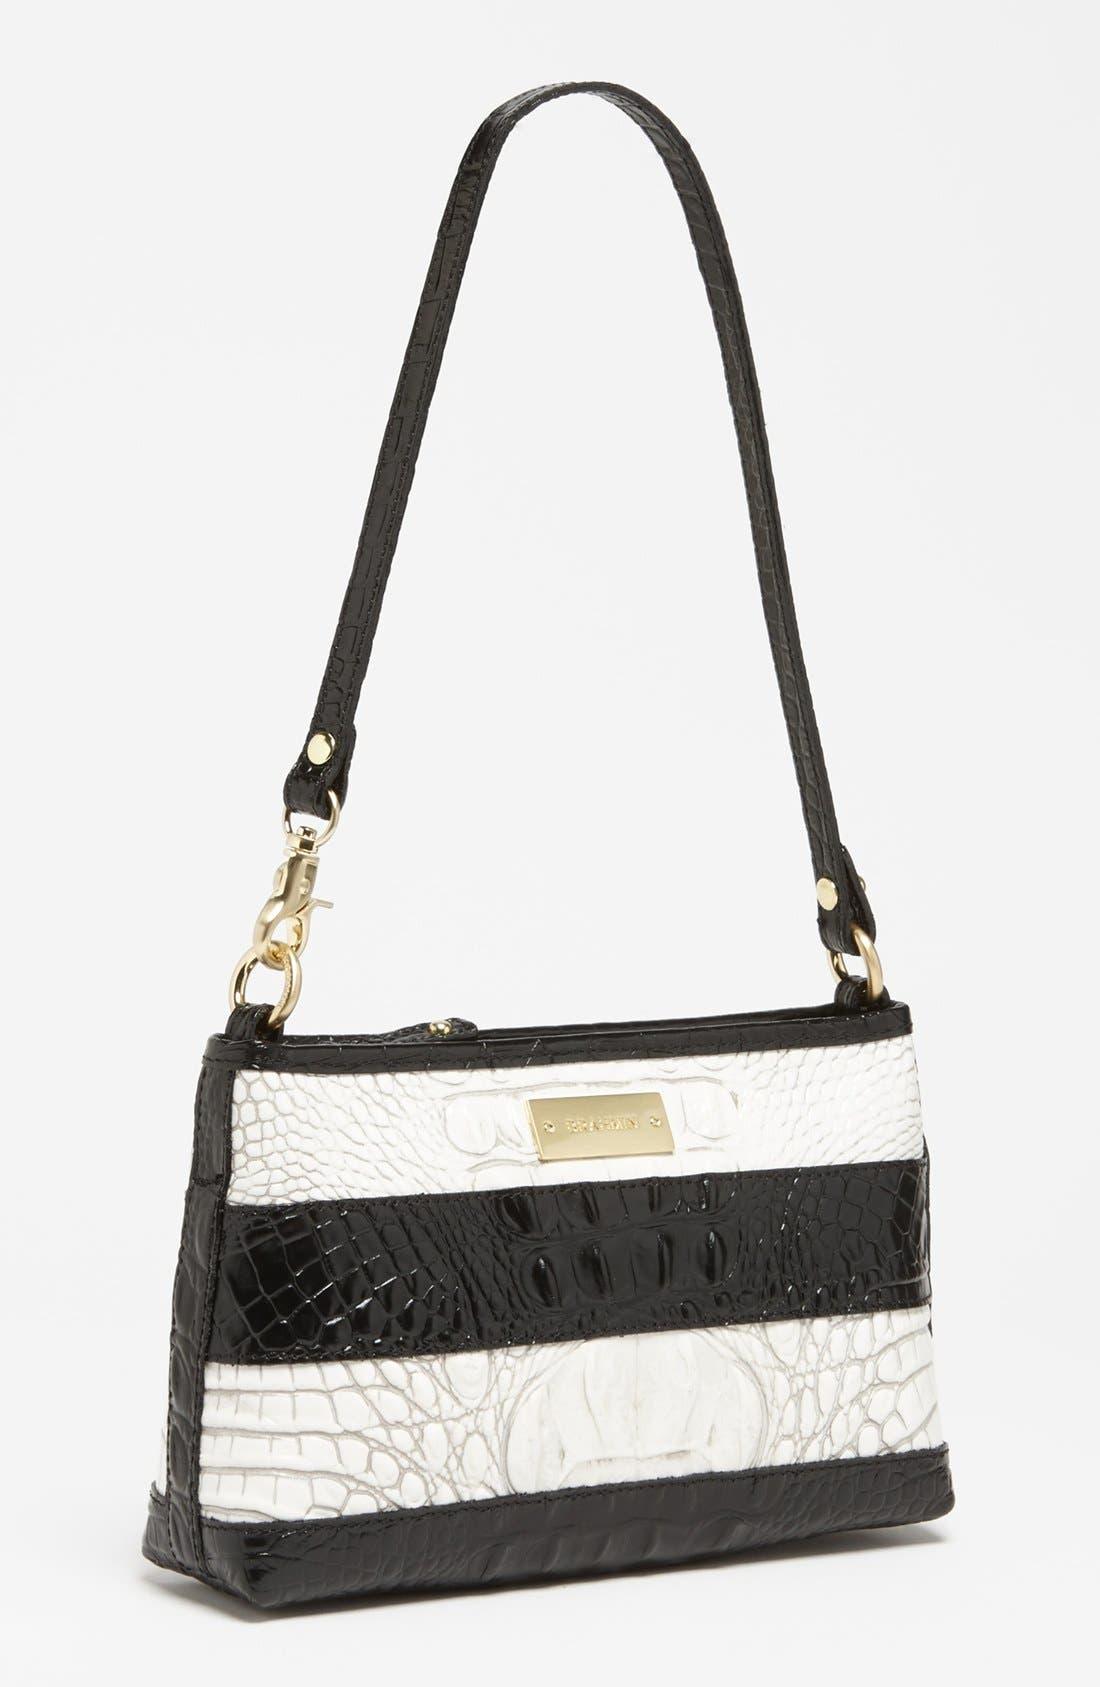 Alternate Image 1 Selected - Brahmin 'Anytime - Mini' Handbag